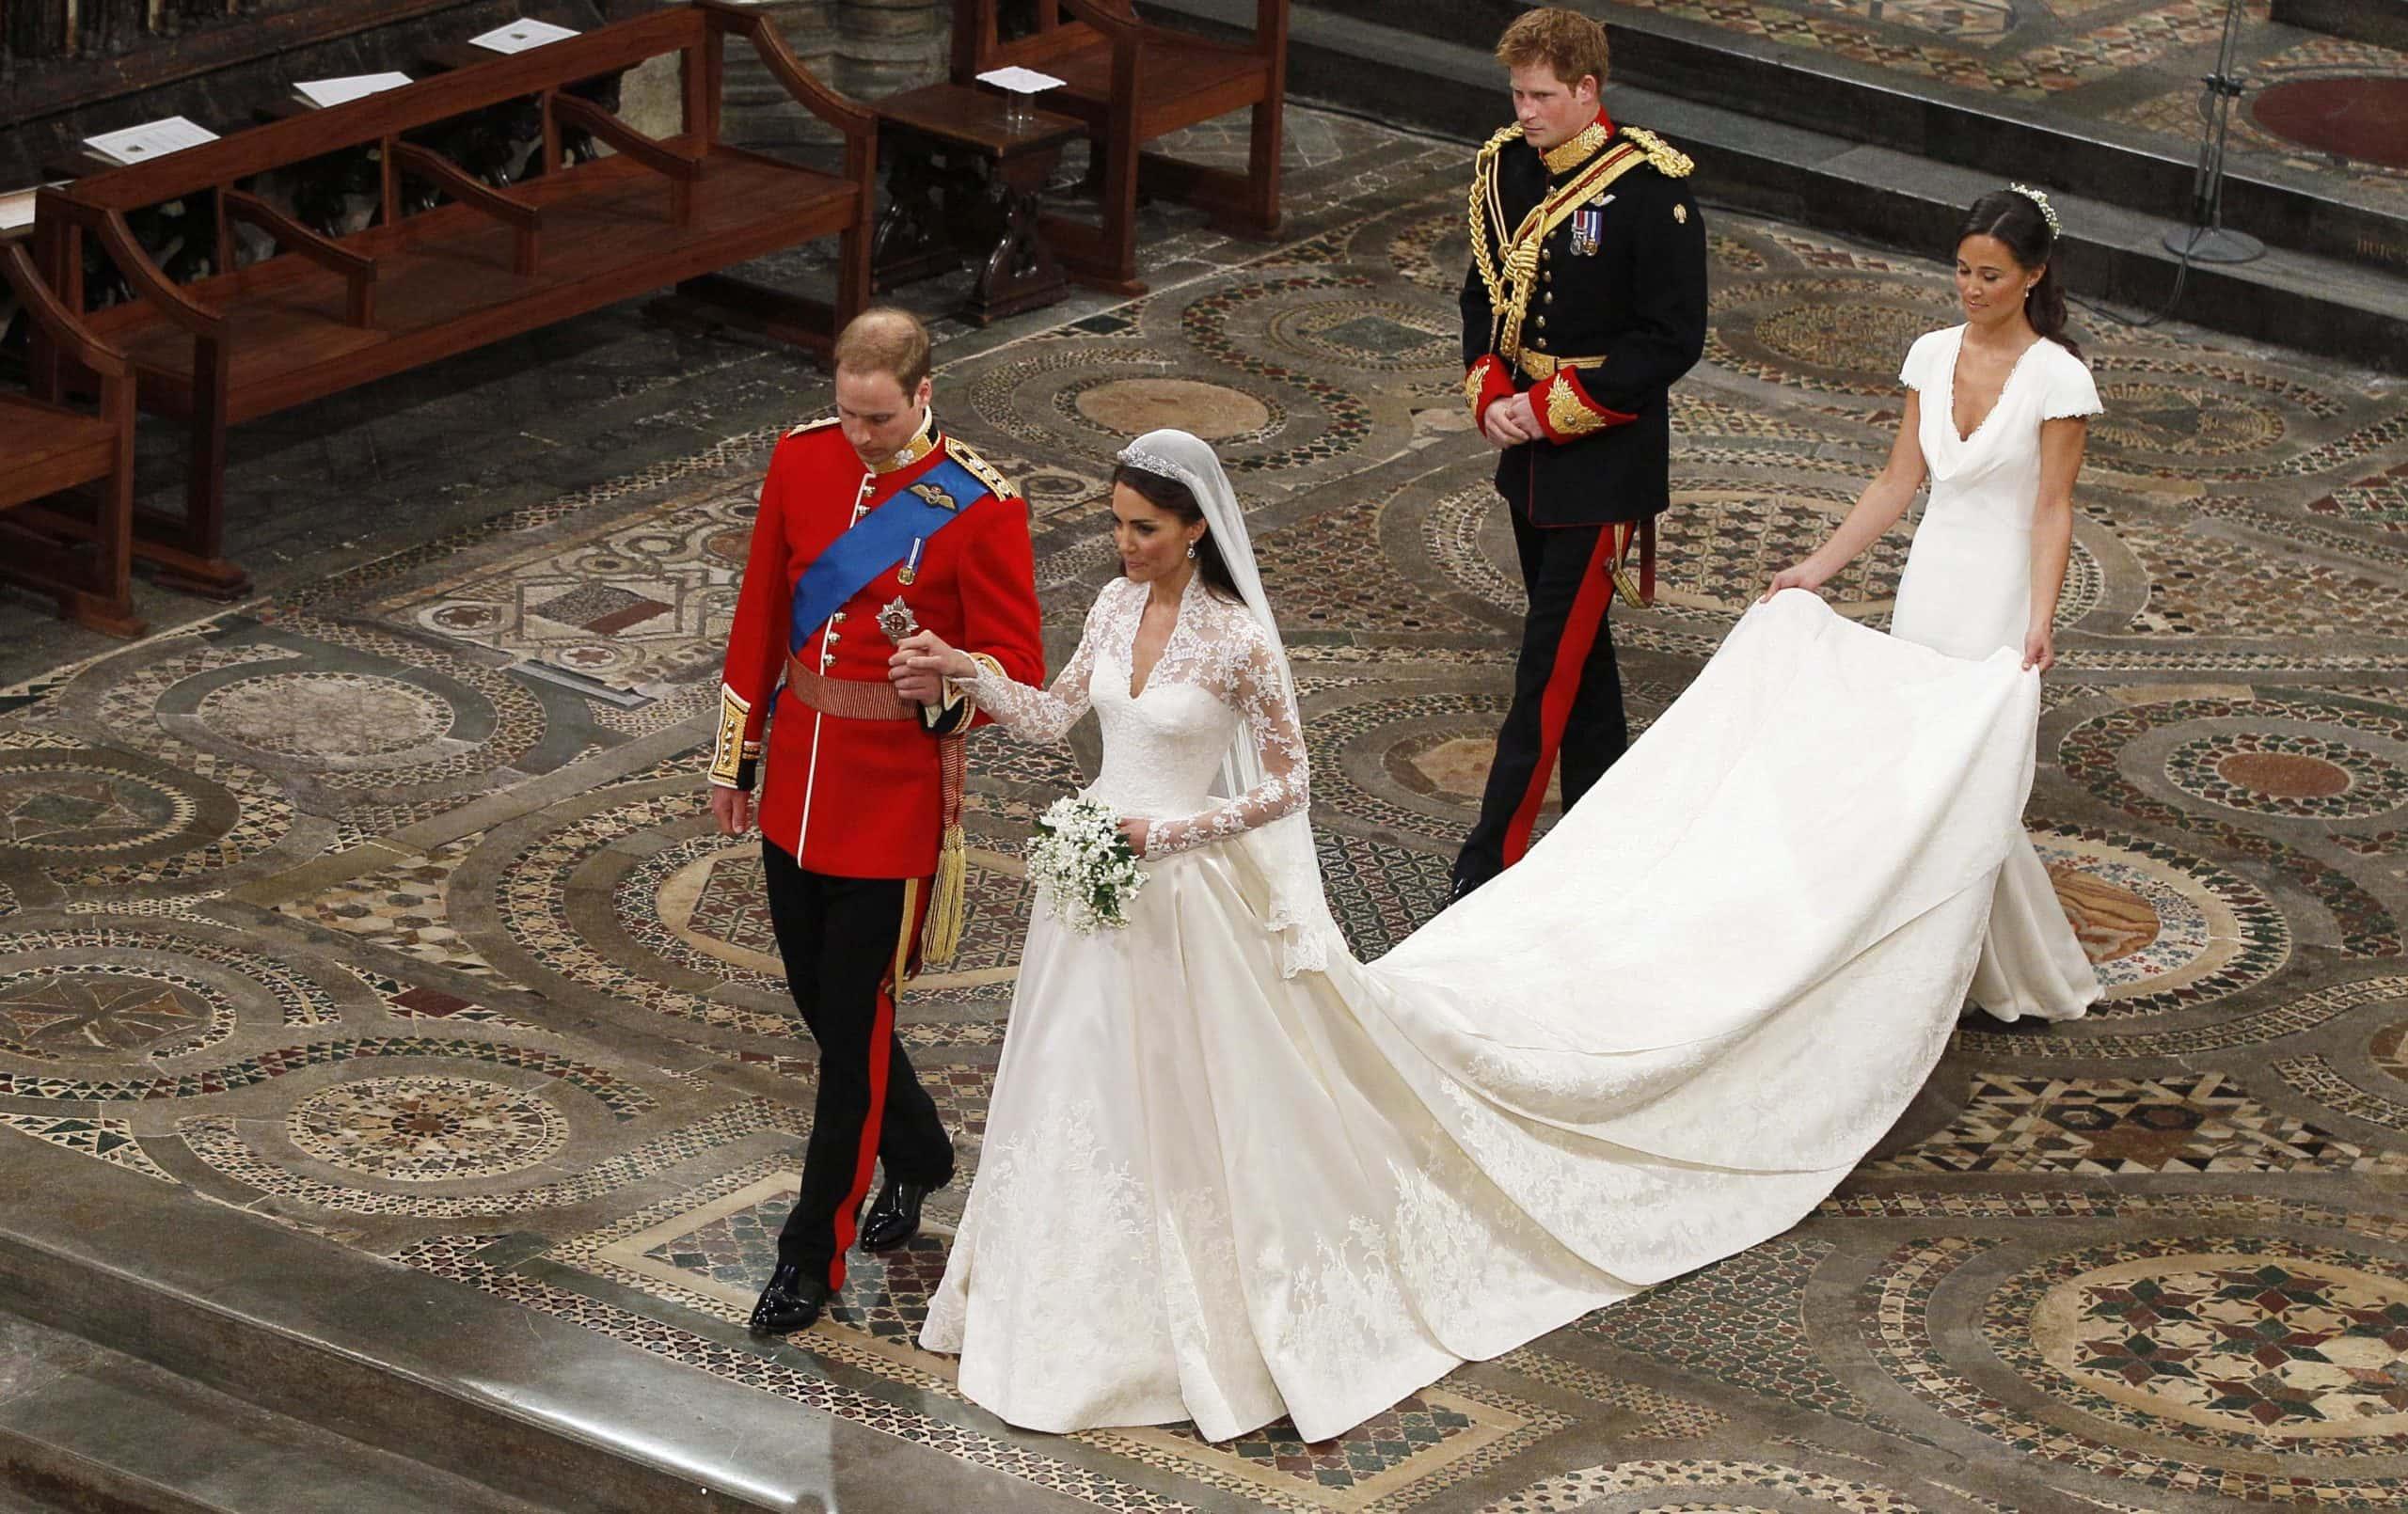 Royal Weddings Facts